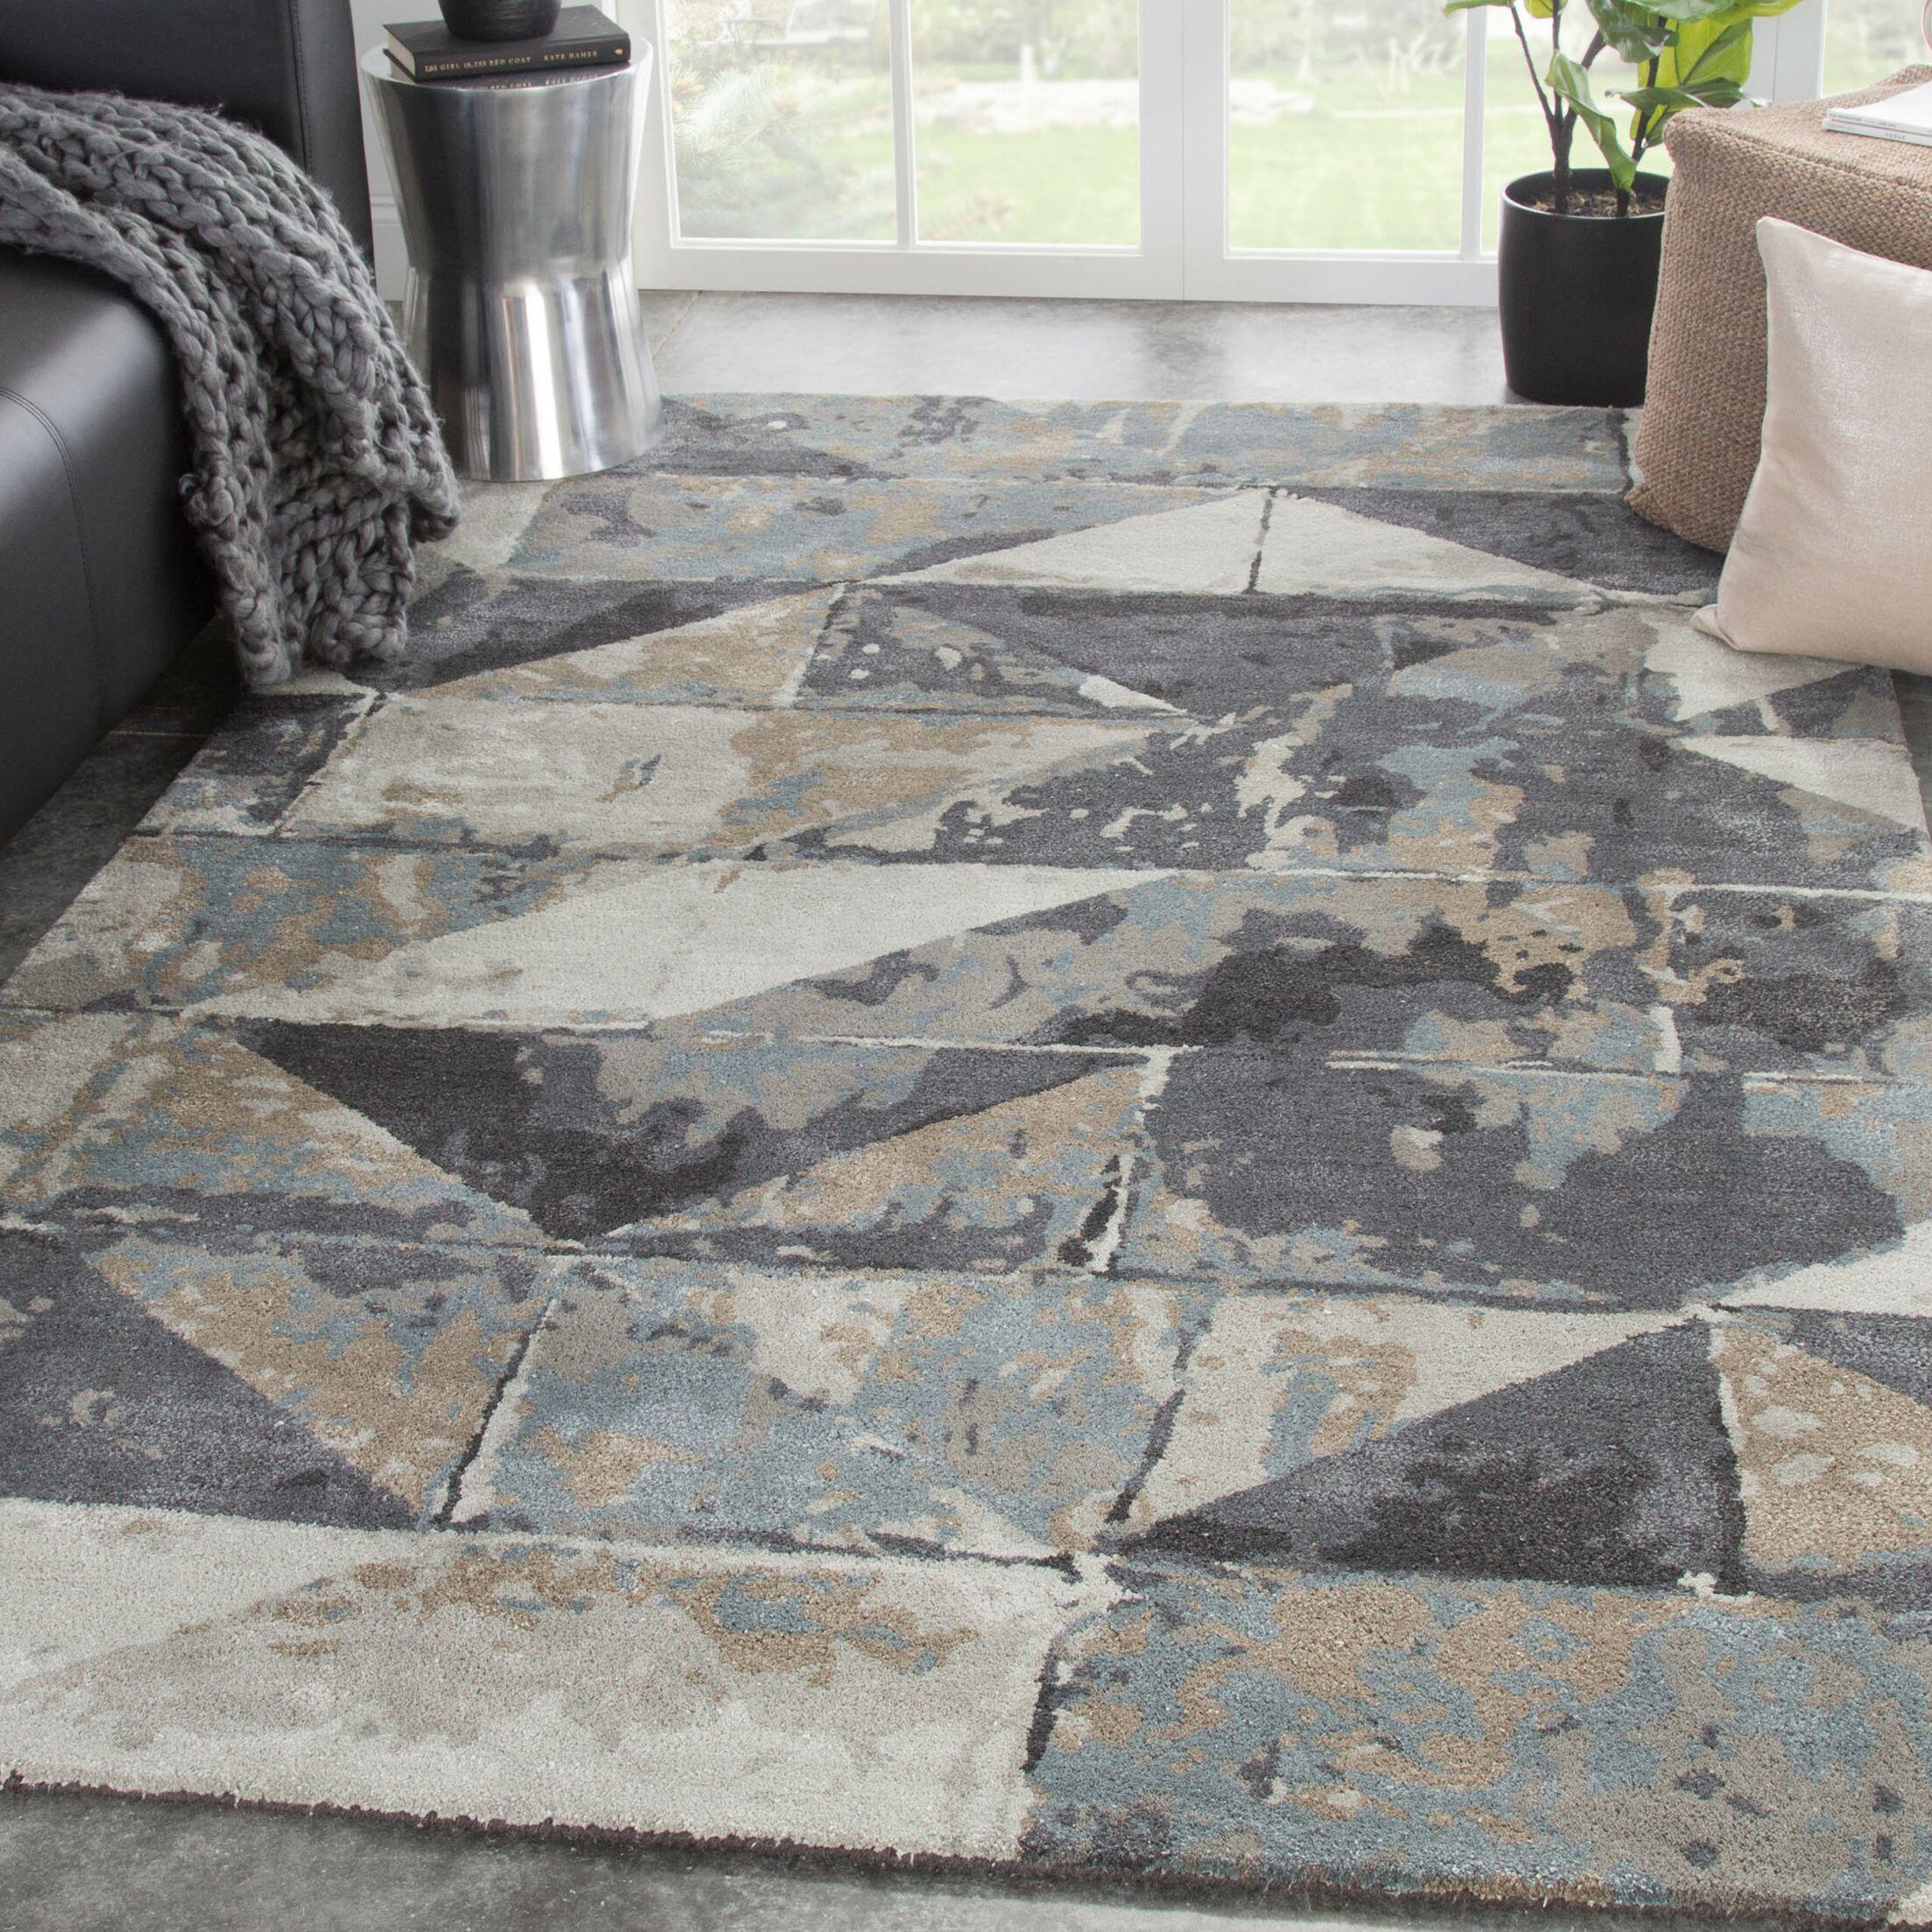 Mintz Geometric Hand-Tufted Gray/Beige Area Rug Rug Size: Rectangle 8' x 11'